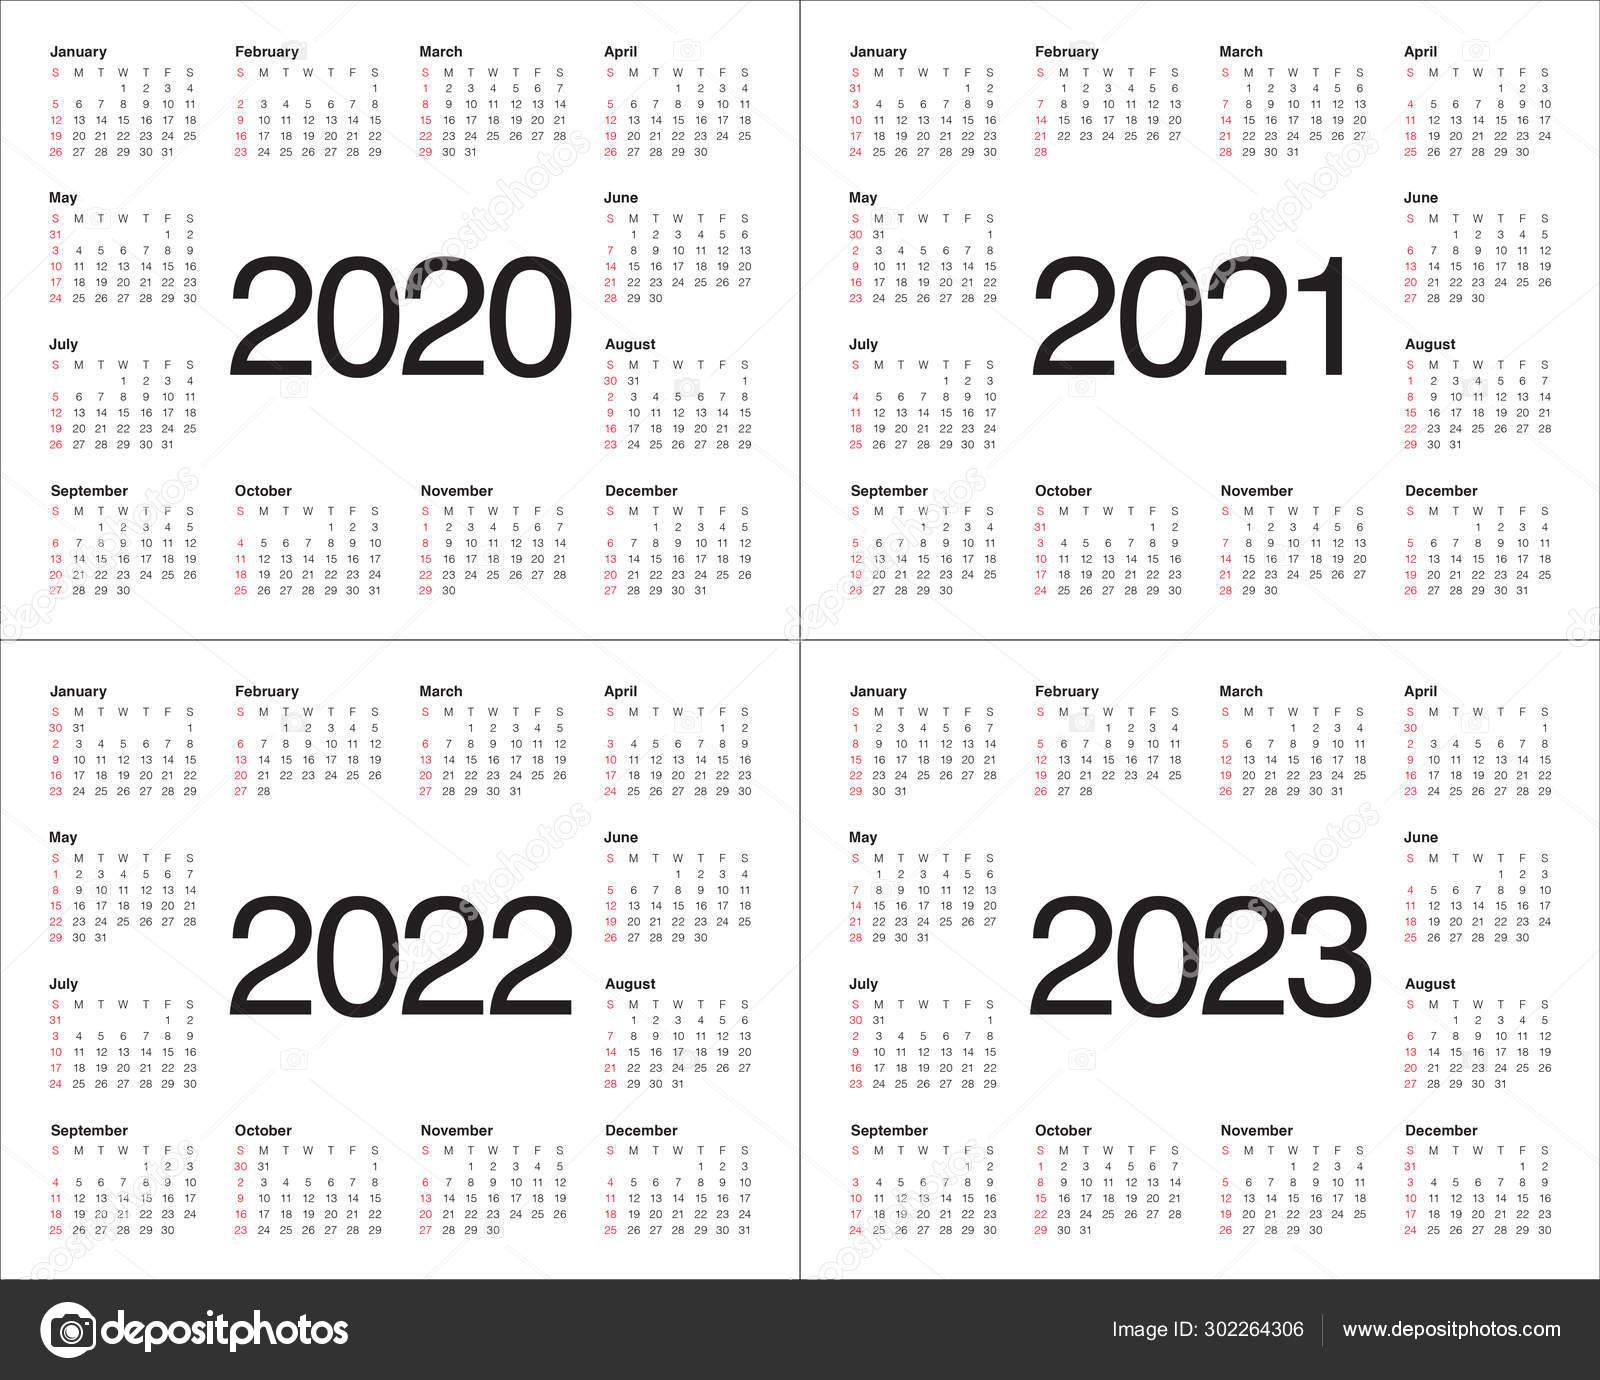 Calendar Template 2022 2023.Year 2020 2021 2022 2023 Calendar Vector Design Template Stock Photo Image By C Dolphfynlow 302264306